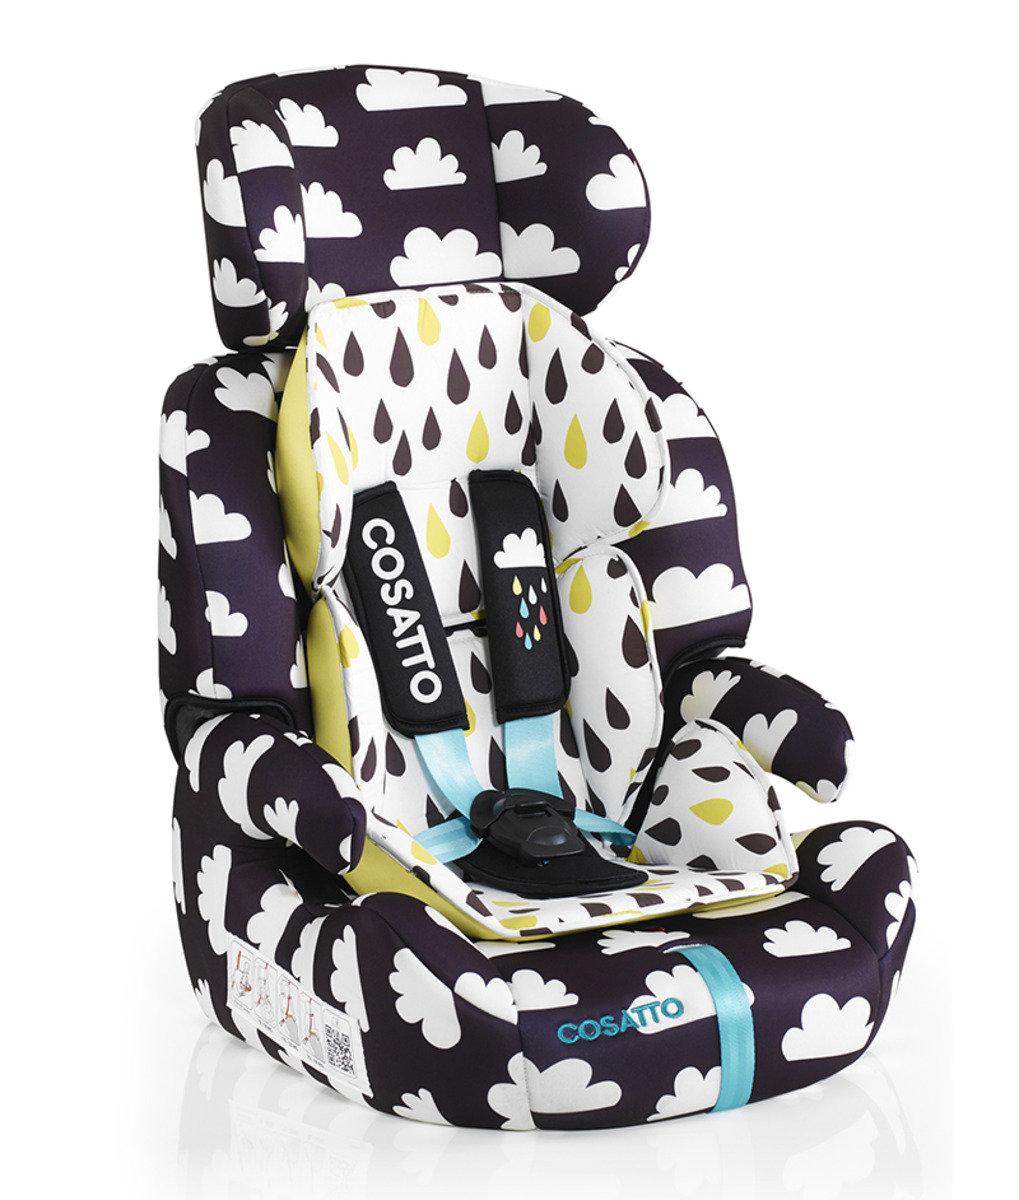 英國 Cosatto Zoomi Group 123 兒童汽車安全座椅 – Cloud 9